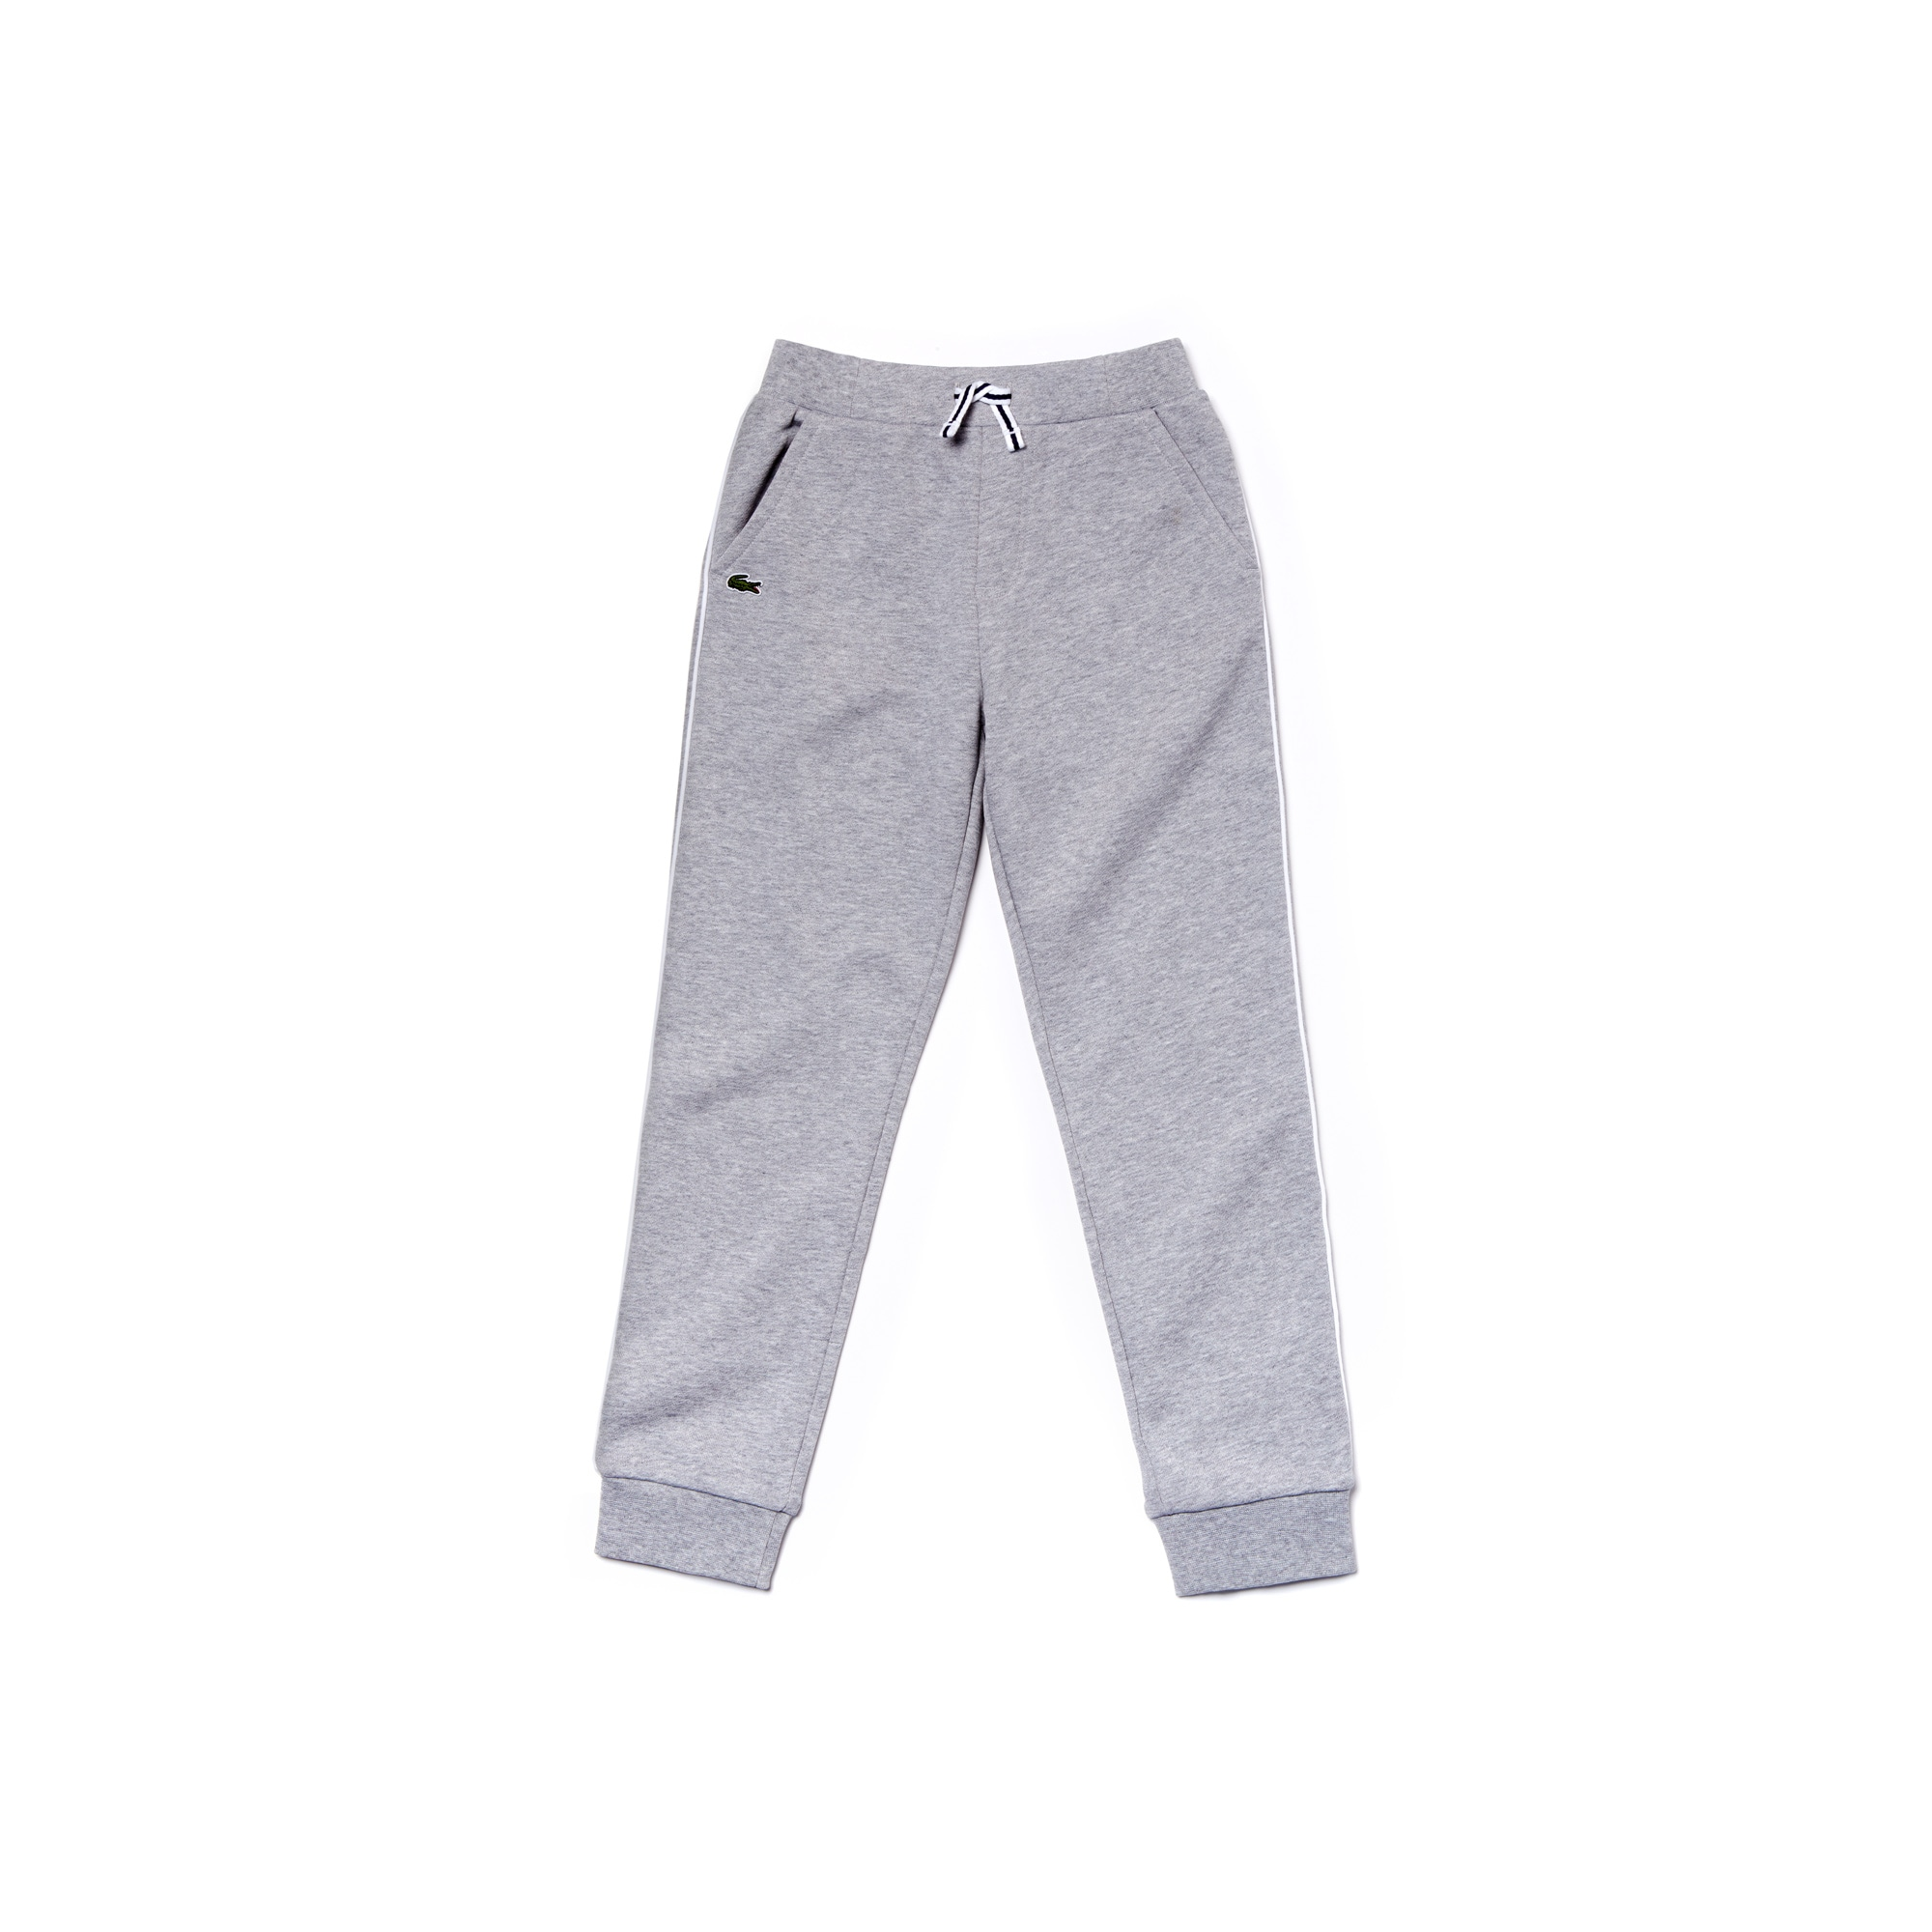 Boys Contrast Bands Fleece Jogging Pants Lacoste